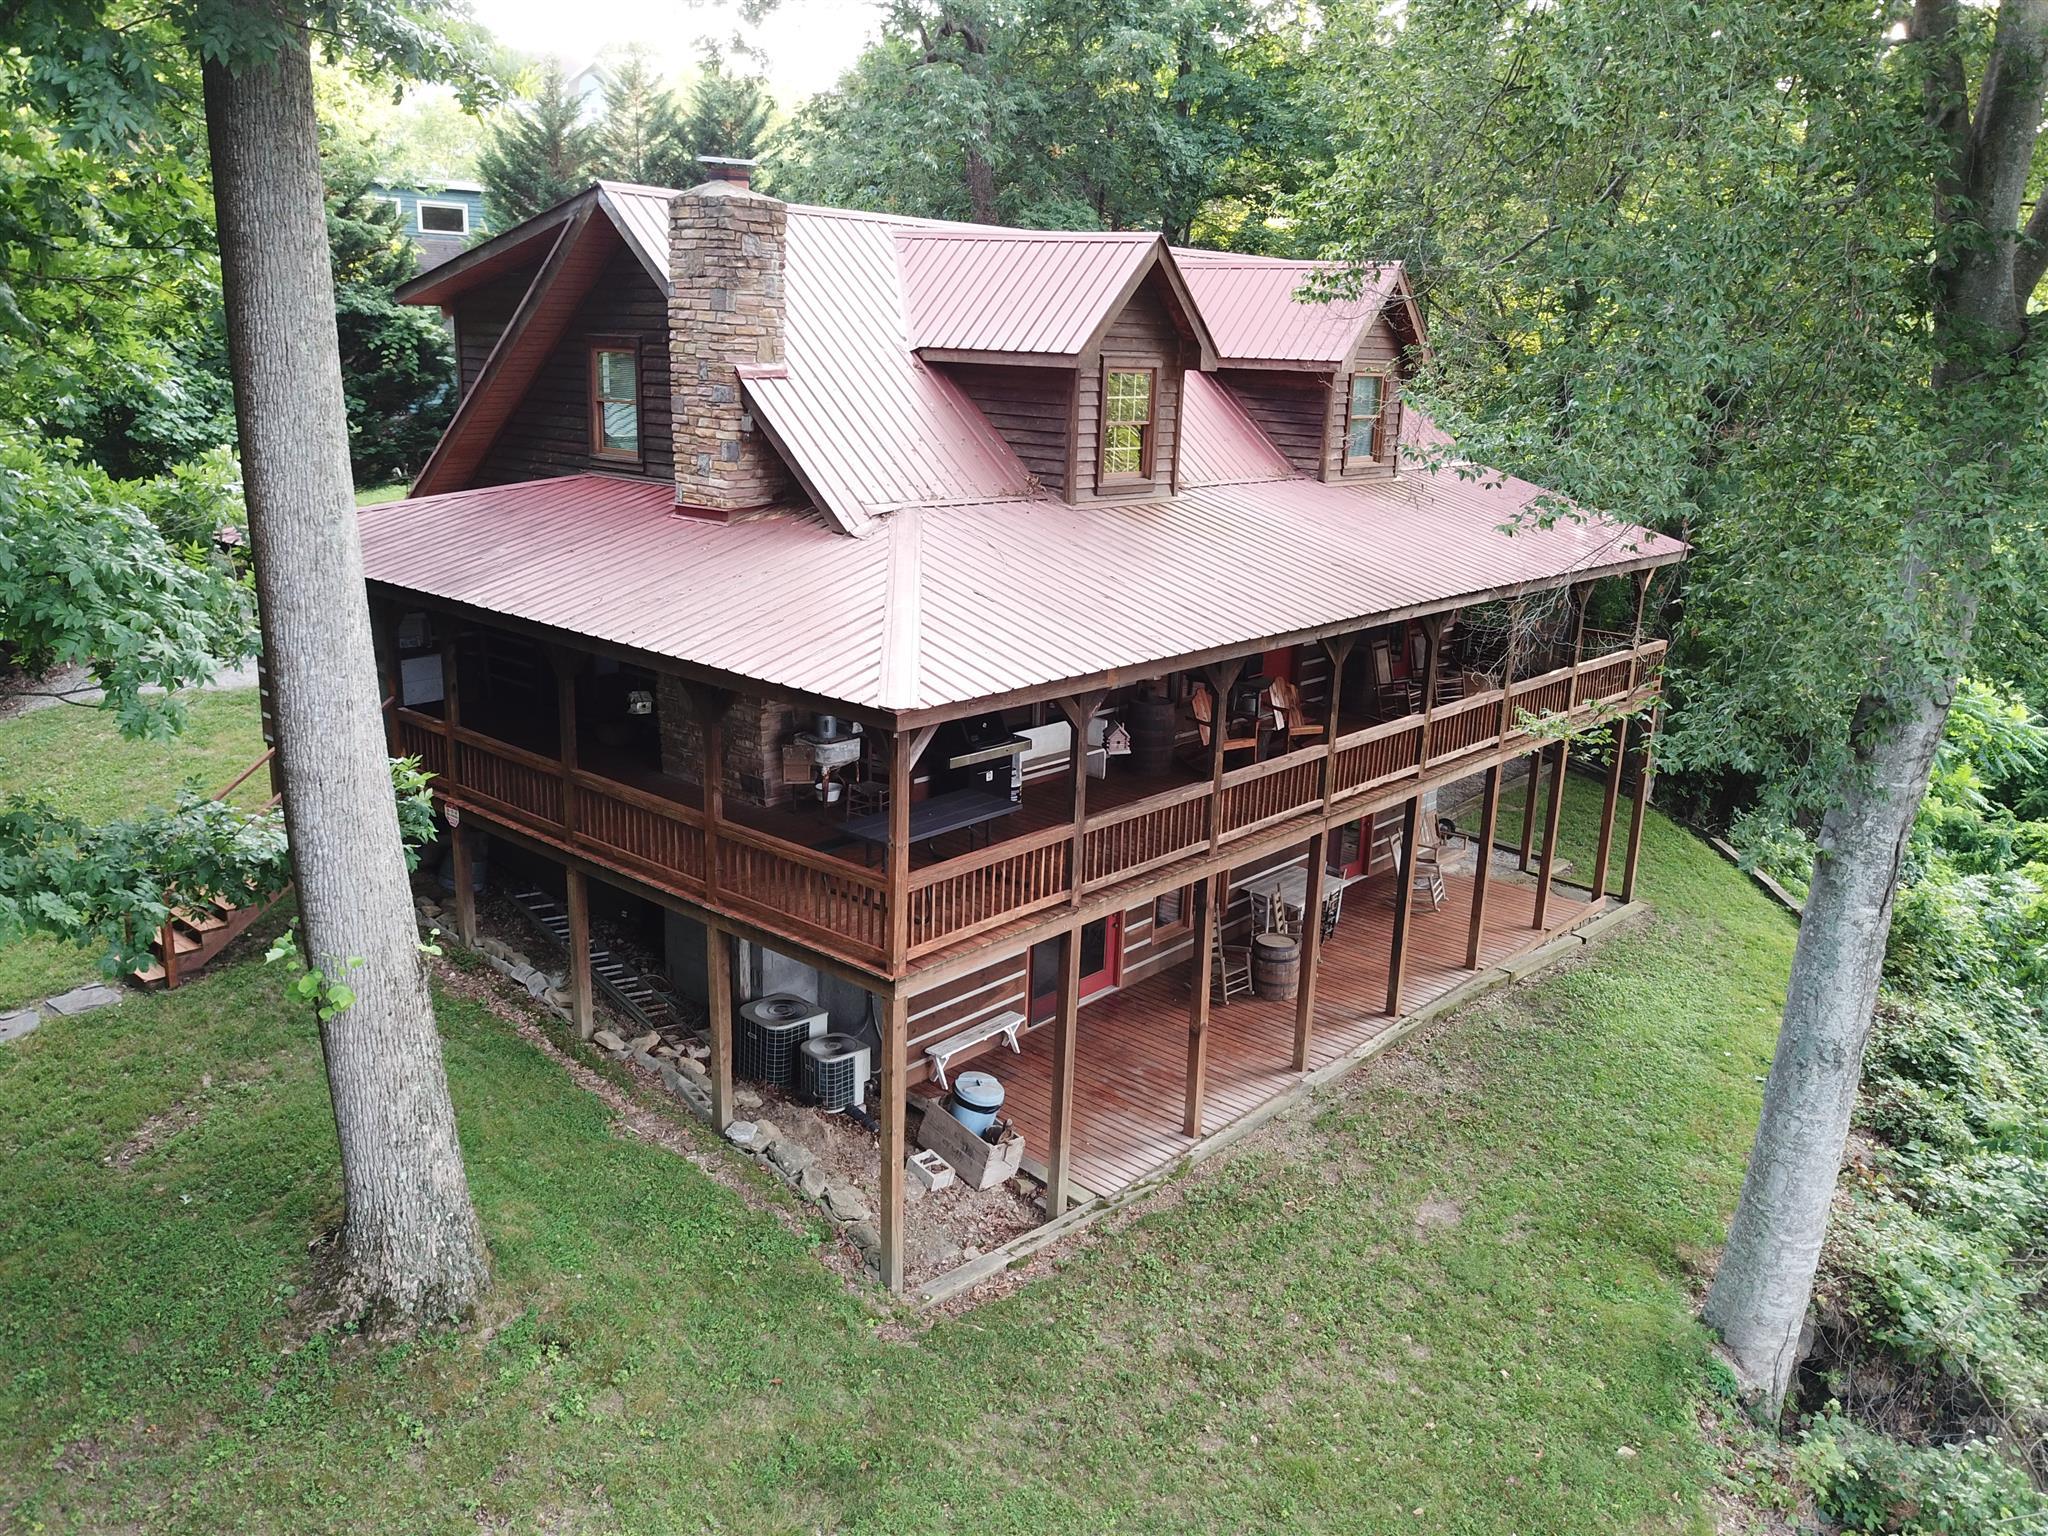 256 E View Dr, Lancaster, TN 38569 - Lancaster, TN real estate listing